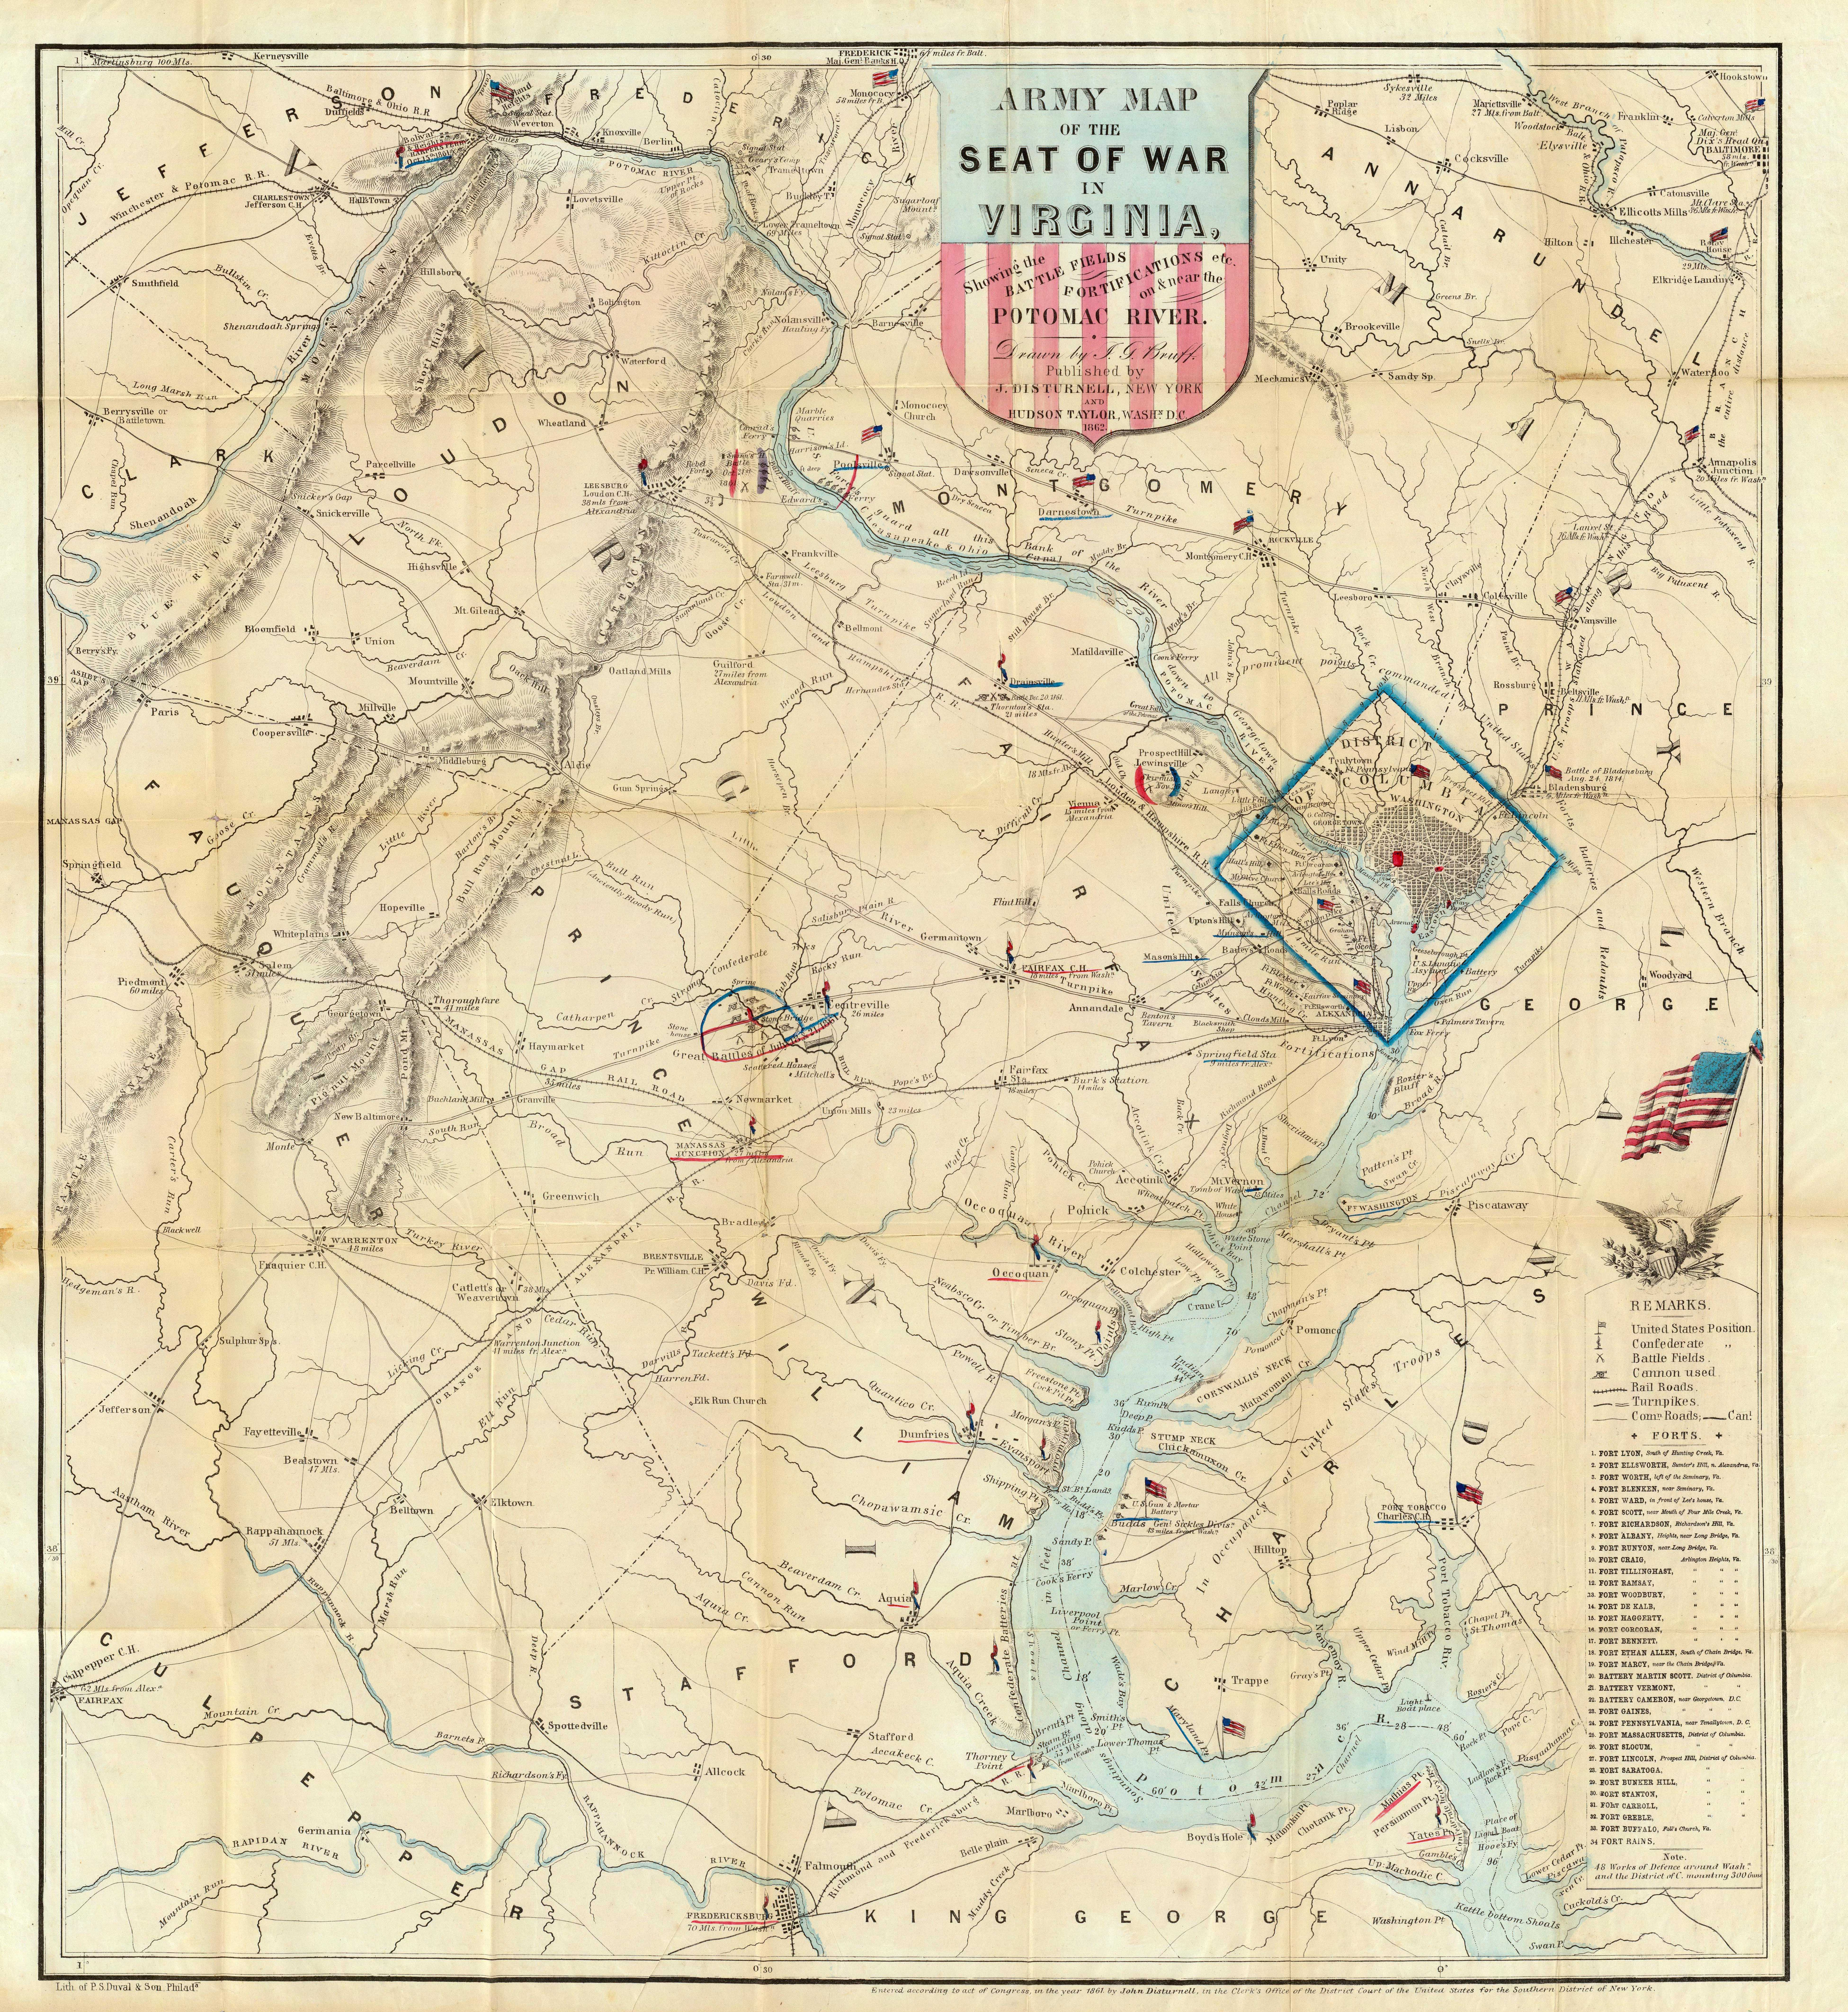 FileNorthern Virginia Civil War Battle Map 1862jpg  Wikimedia